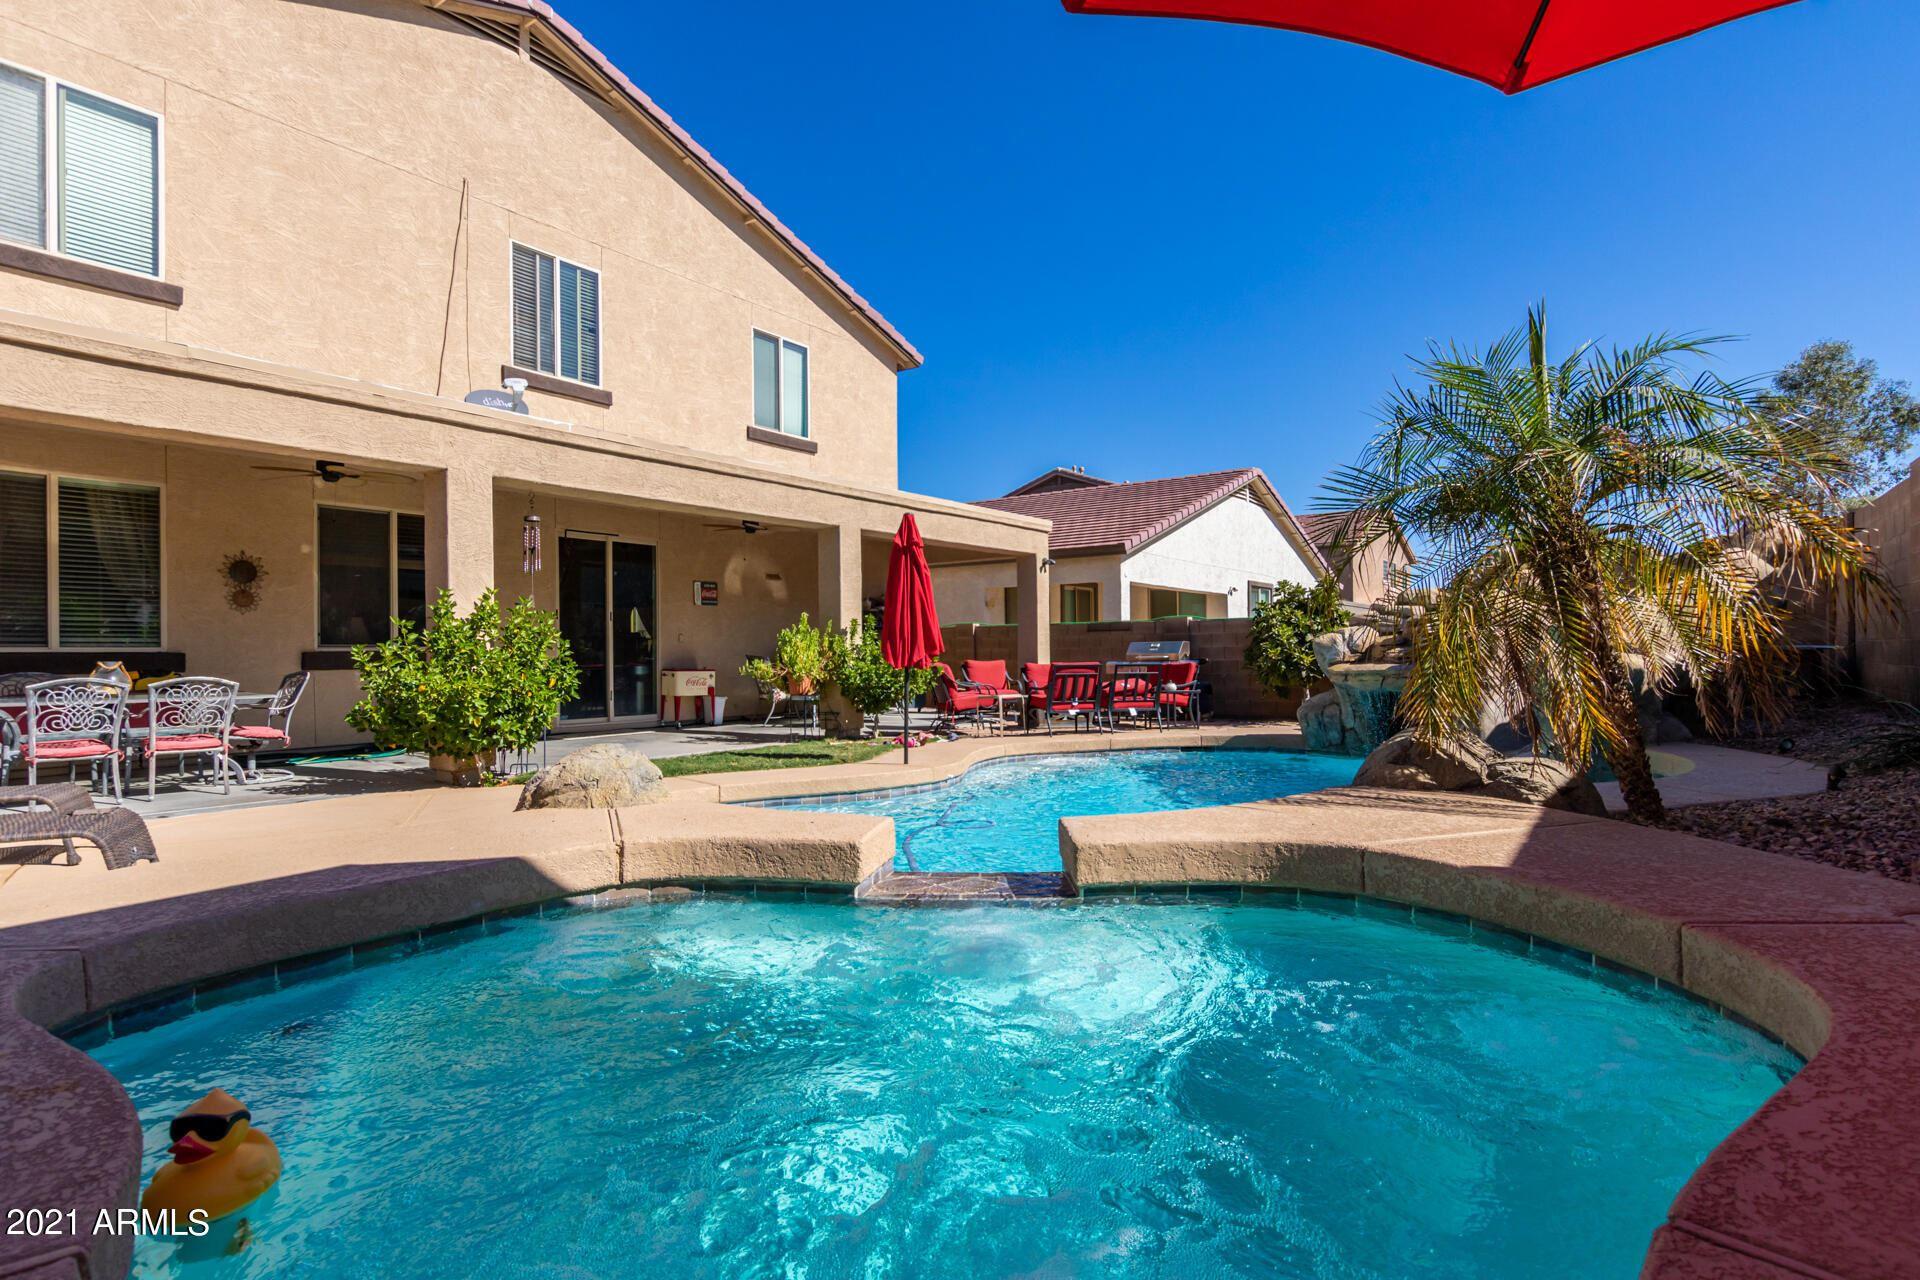 Photo for 42483 W CORVALIS Lane, Maricopa, AZ 85138 (MLS # 6288655)